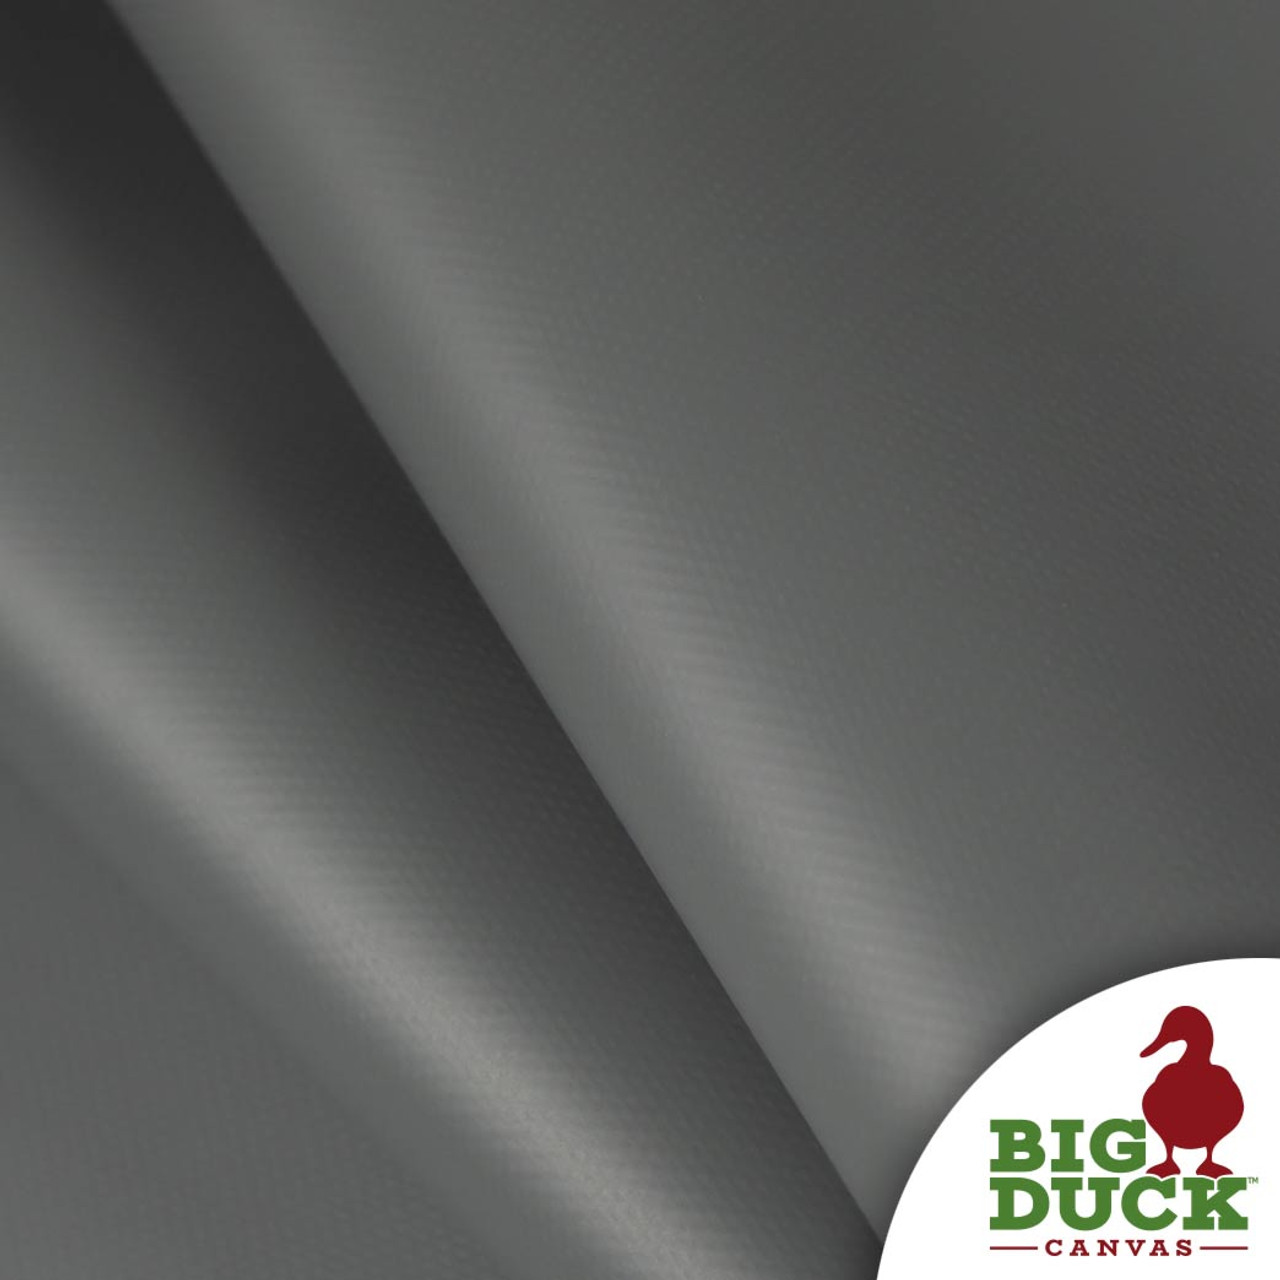 Vinyl Fabric-Industrial Coated, Fire Retardant 18oz/61